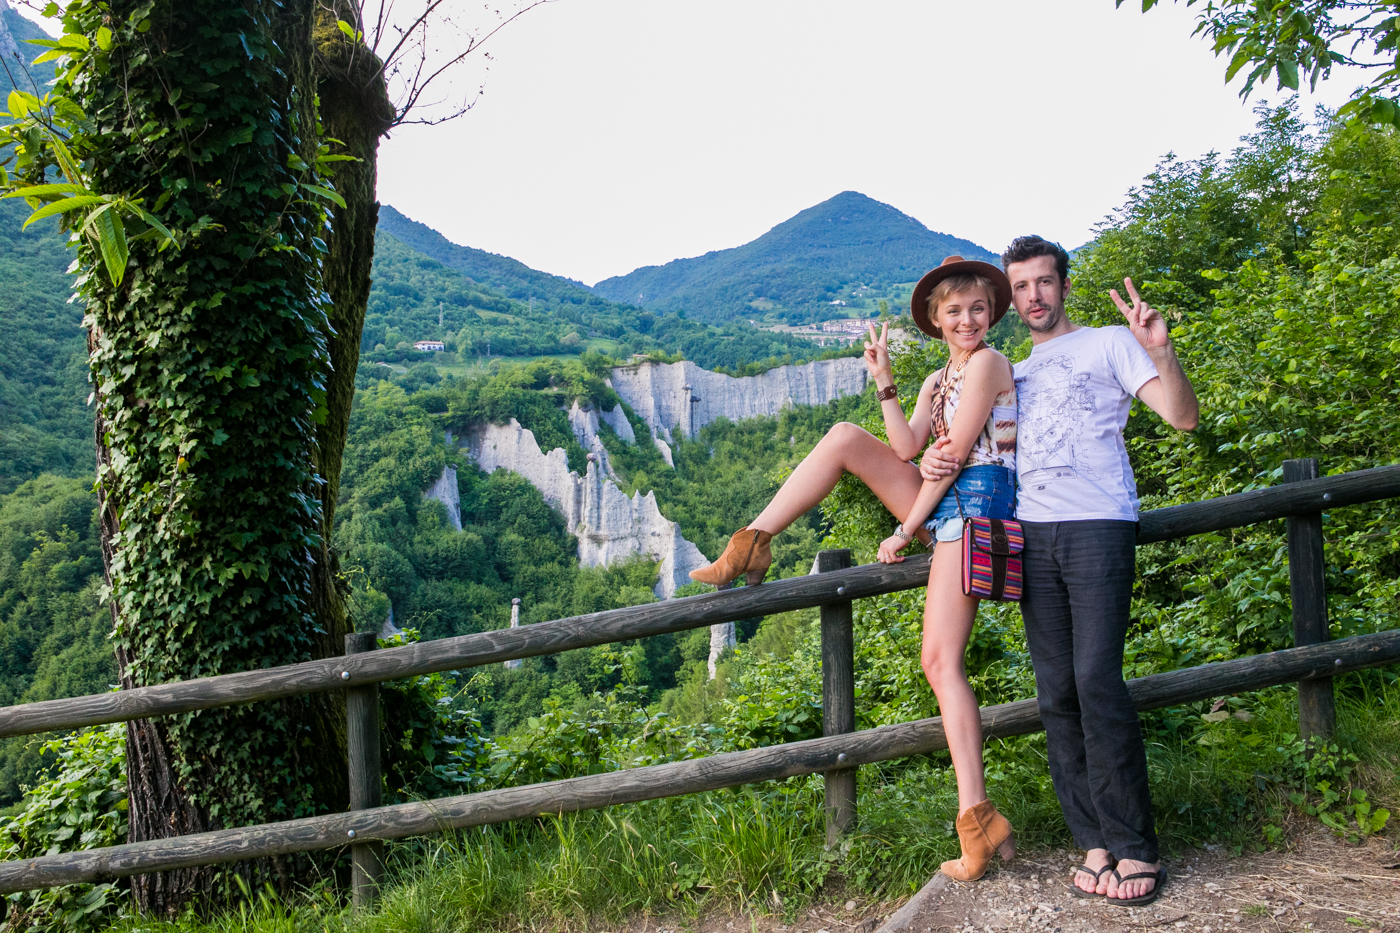 thecablook darya kamalova fashion blog street style denim shorts ash booties hm hat iseo lake piramidi di zona brescia-140